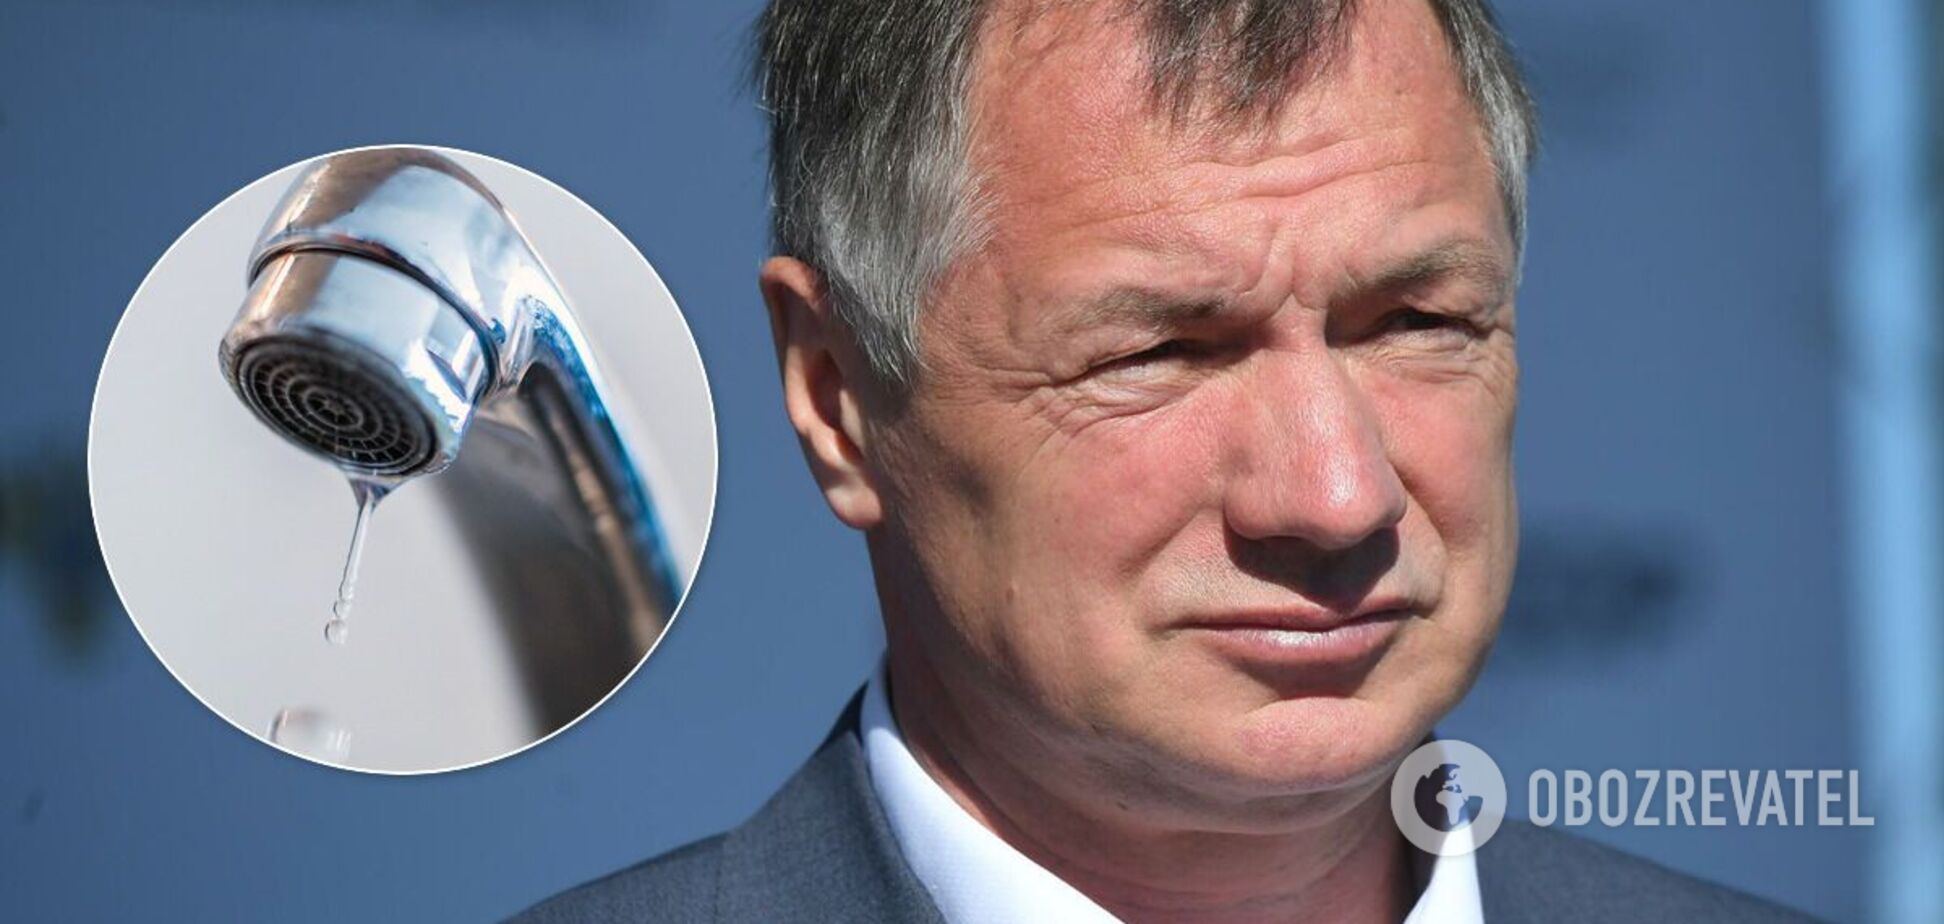 Хуснуллін пояснив дефіцит води в Криму